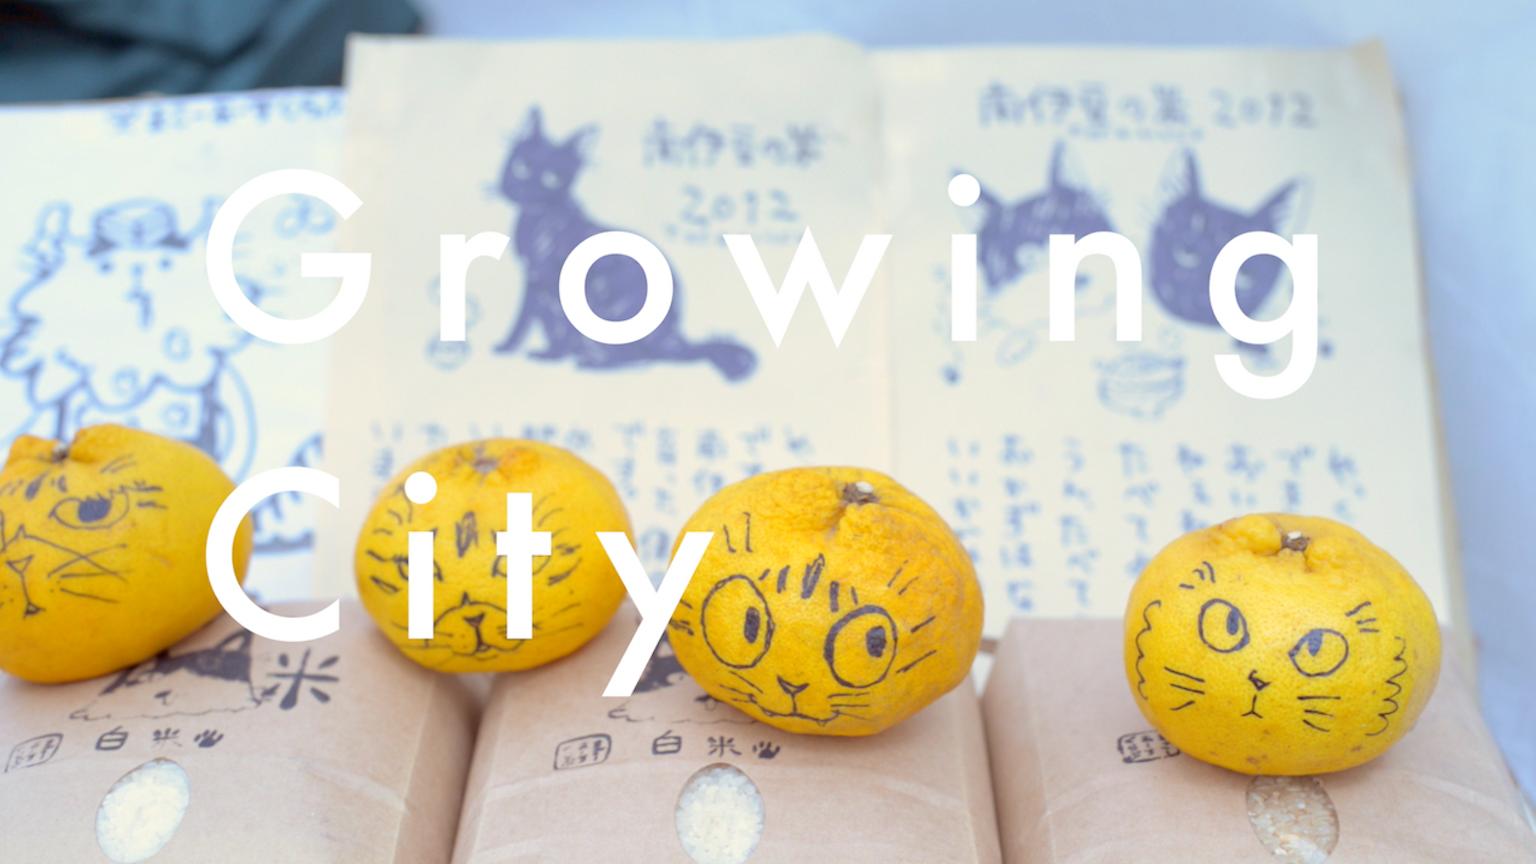 Growing City - A Documentary by Nick Sugihara —Kickstarter